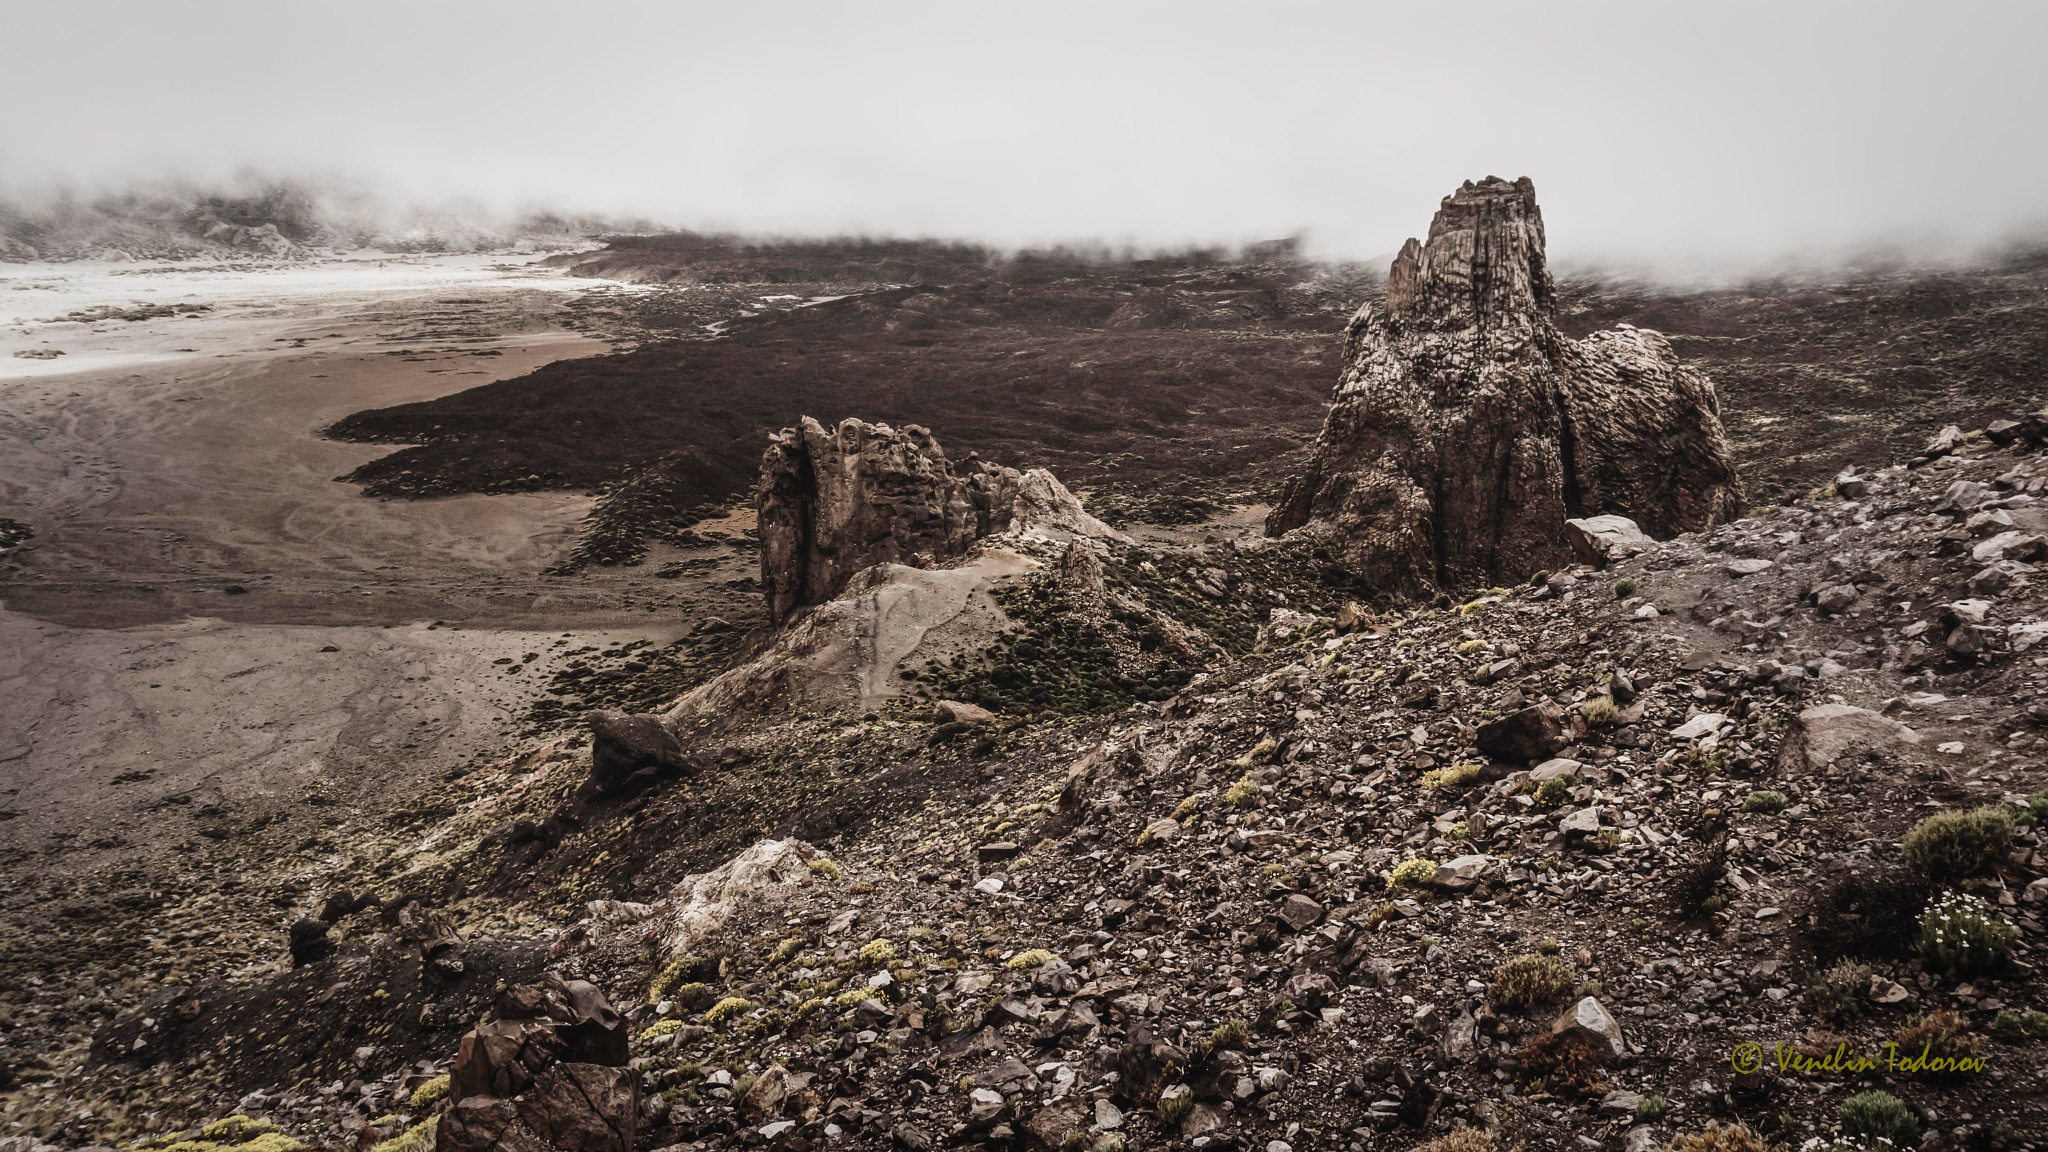 Wilderness by Venelin Todorov